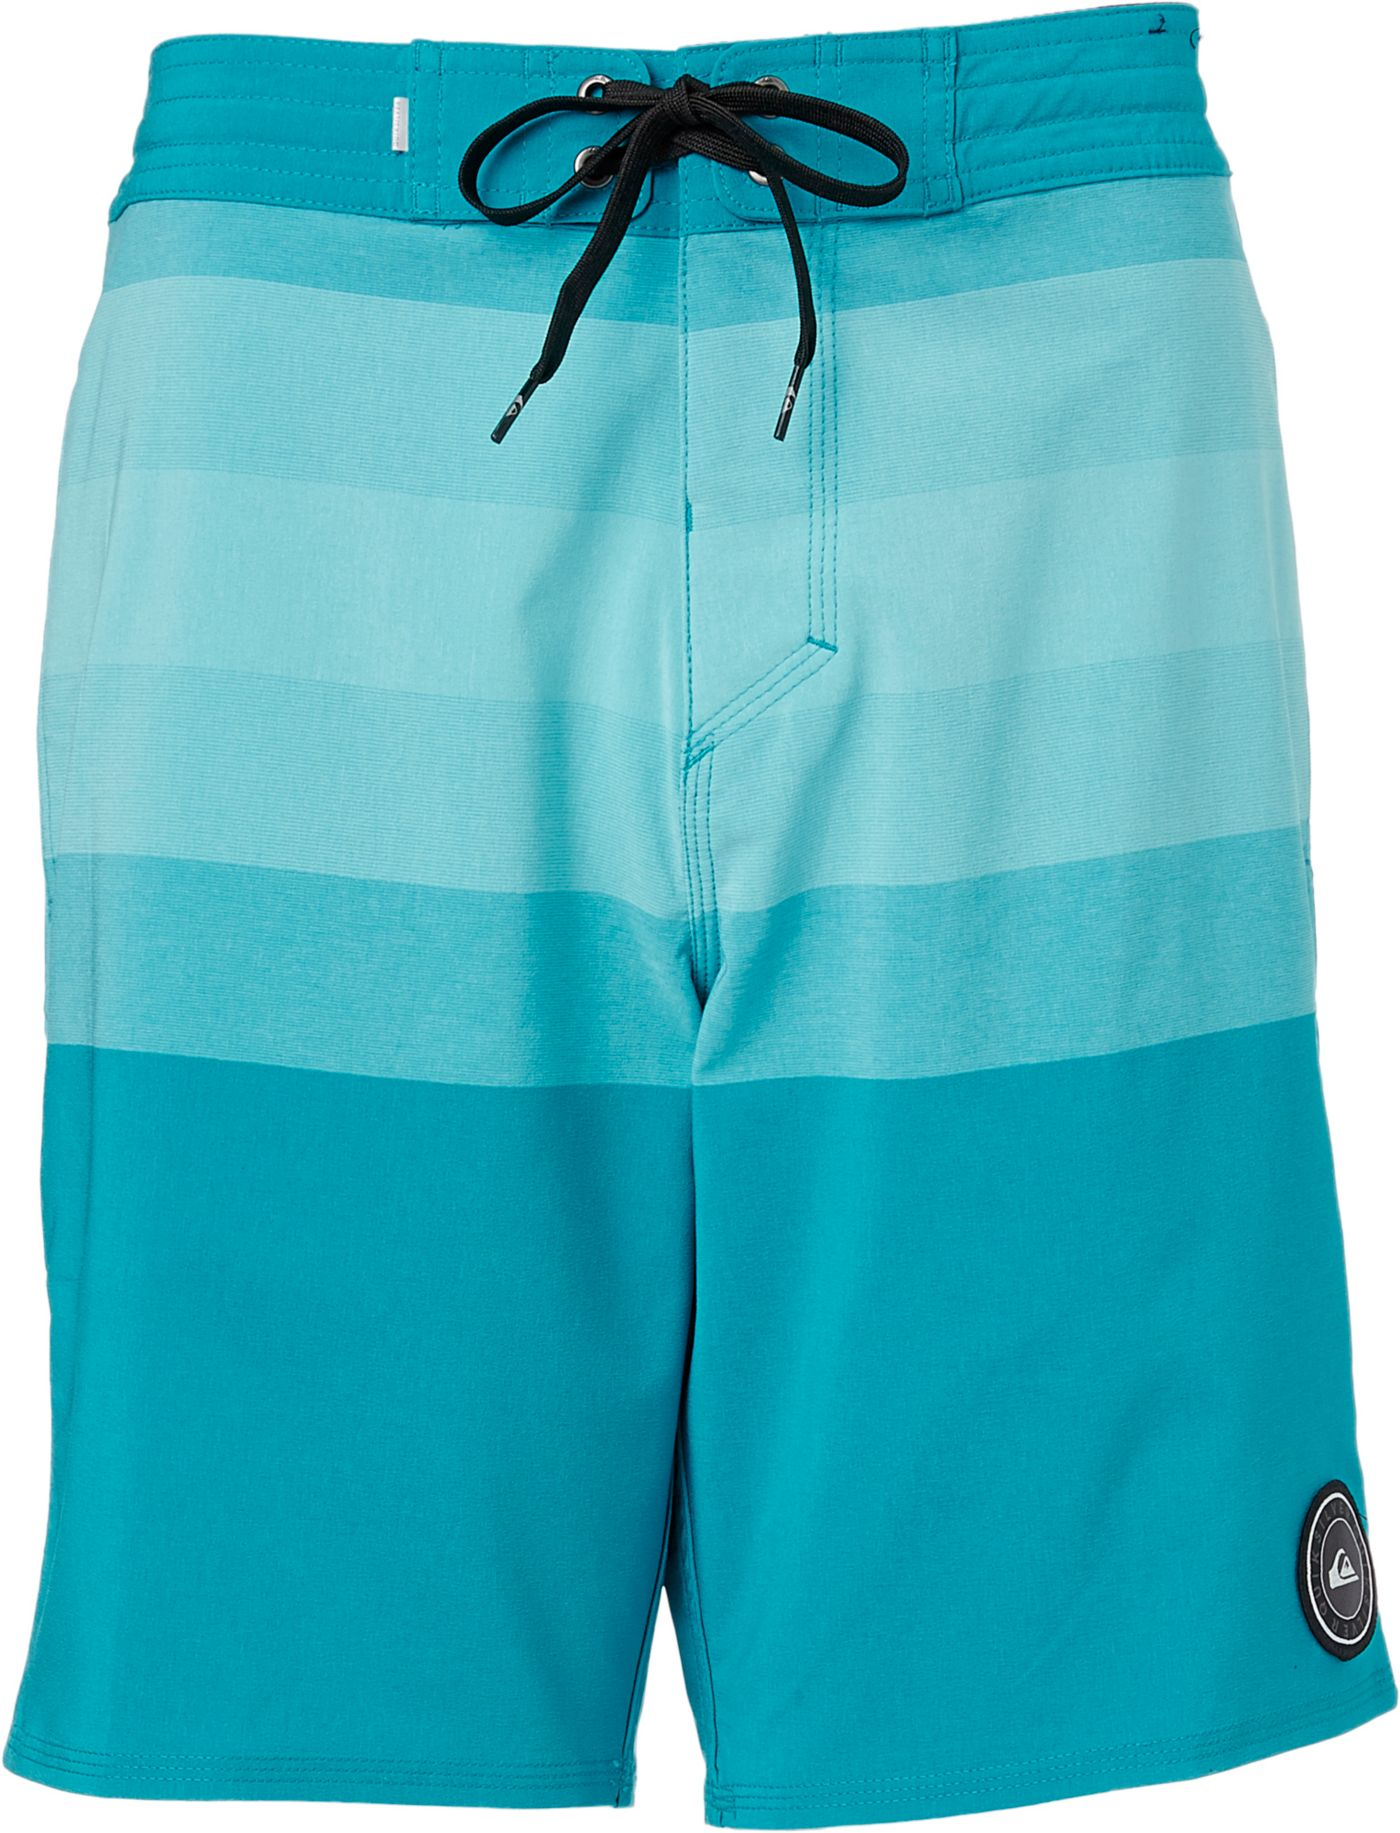 Quiksilver Men's Vista Beach Board Shorts